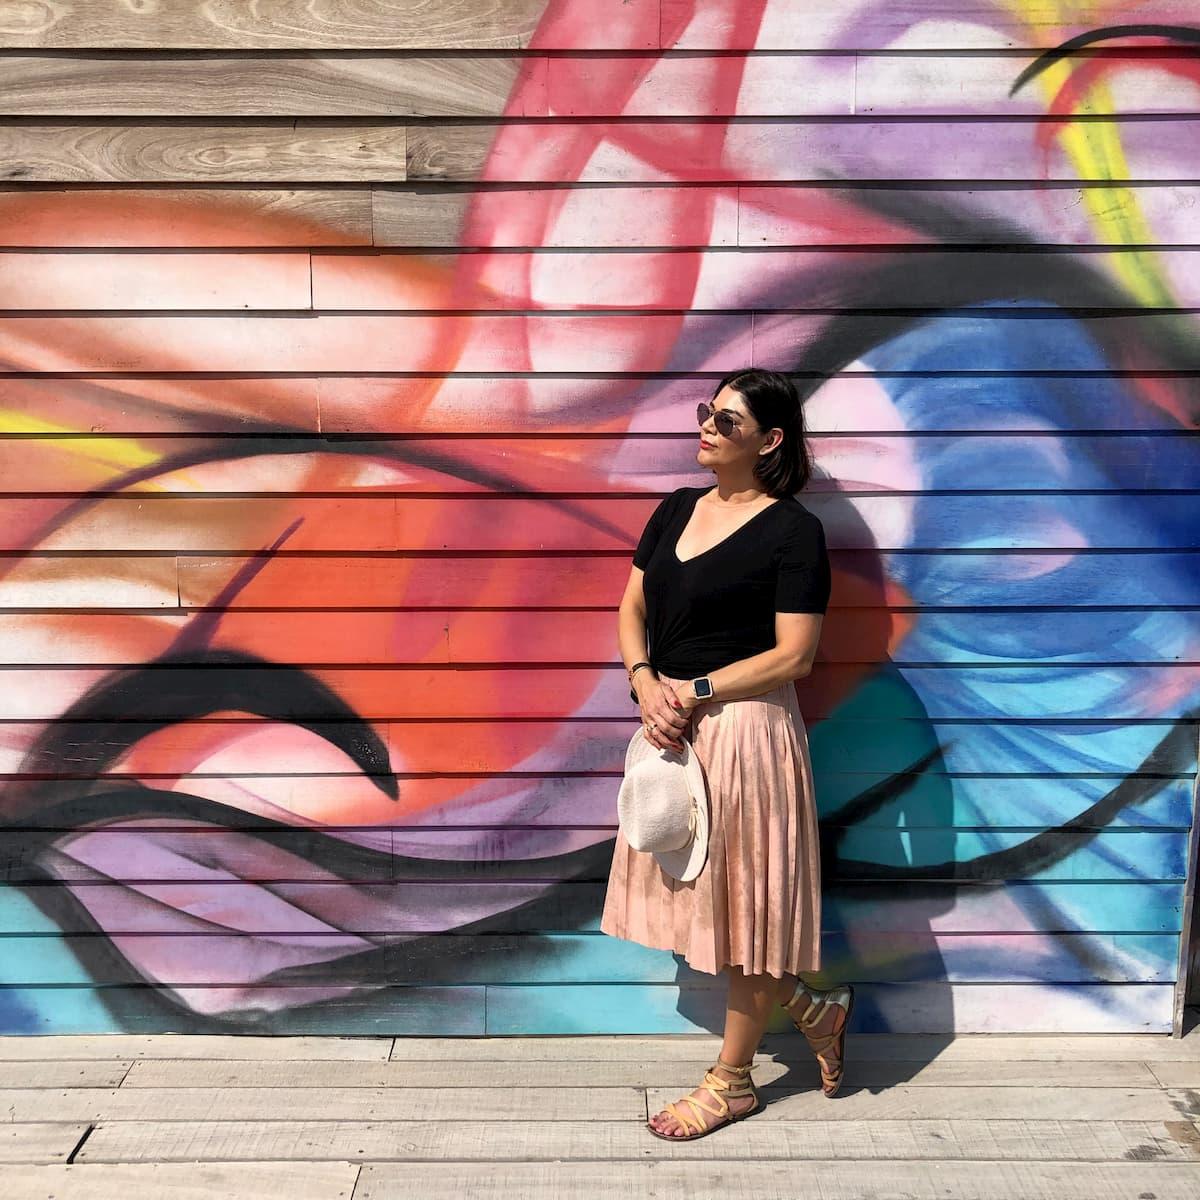 La Mer Beach Street Art – Dubai